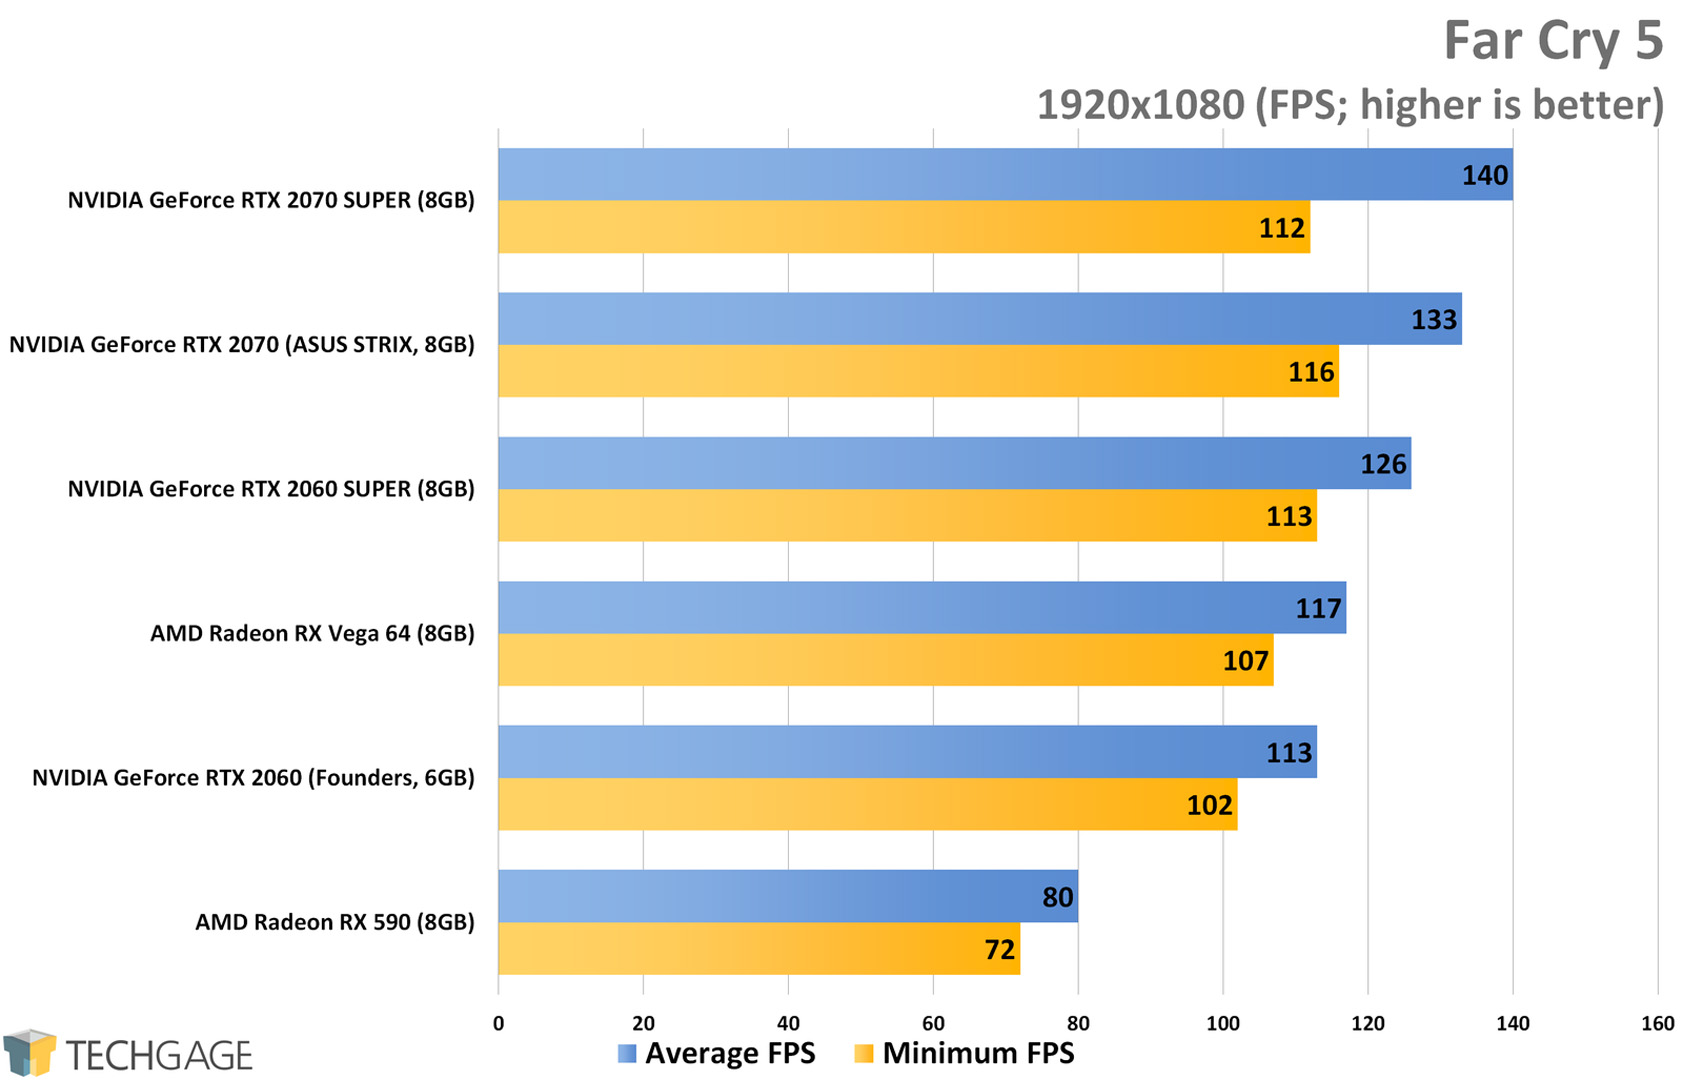 Far Cry 5 (1080p) - NVIDIA RTX SUPER 2060 and 2070 Performance